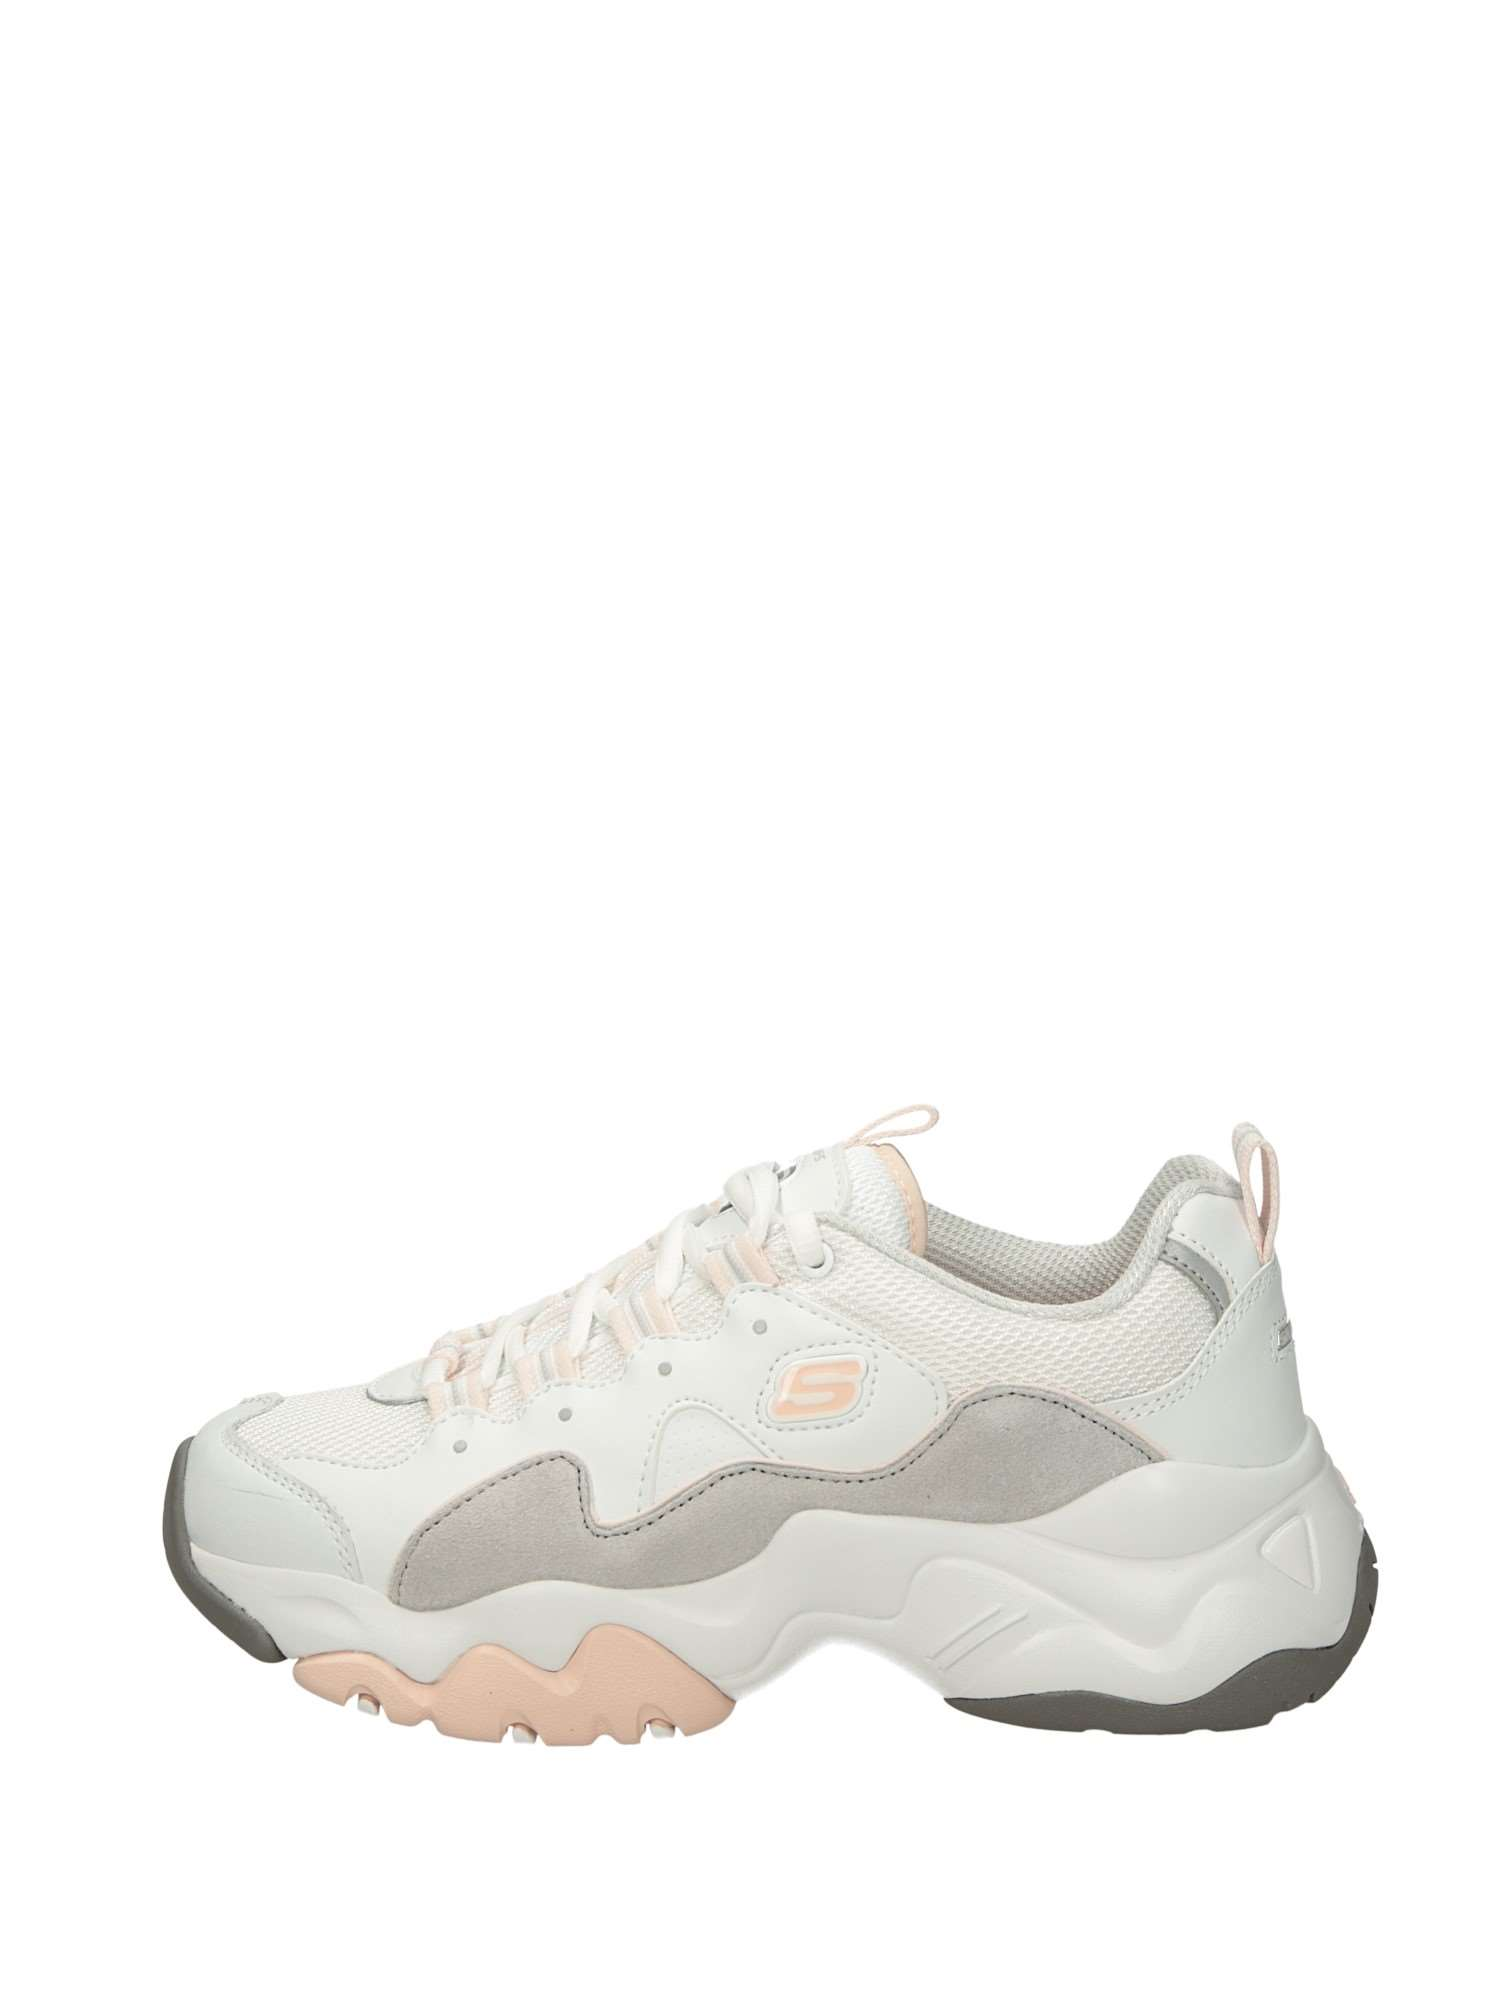 best sneakers 714b6 c4dee Skechers Sneakers Zeppa Donna Bianco Rosa | Lalilina